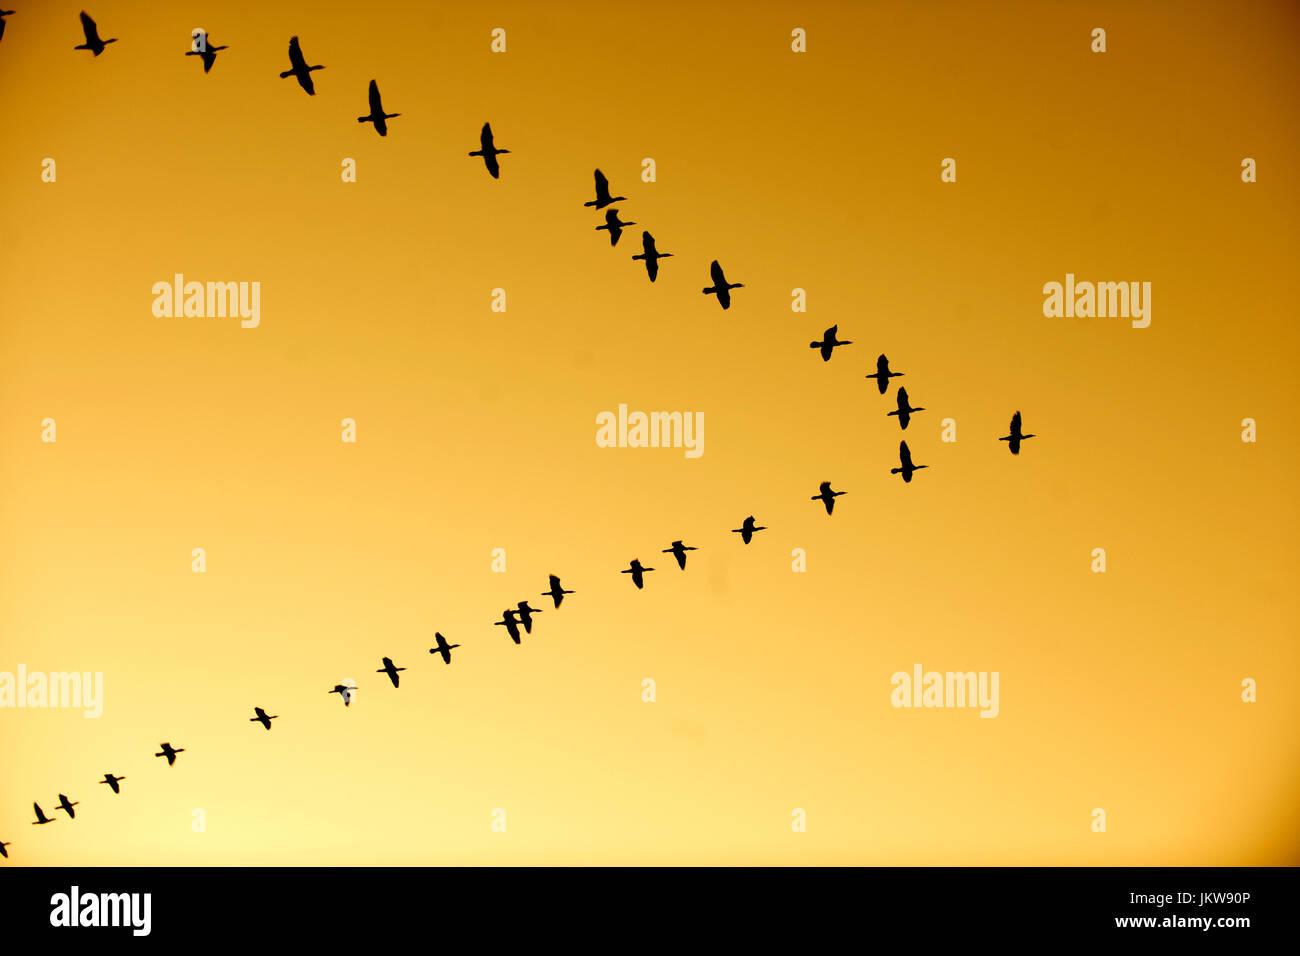 Aegypten, Assuan, Kormorane im Formationsflug über dem Niltal - Stock Image